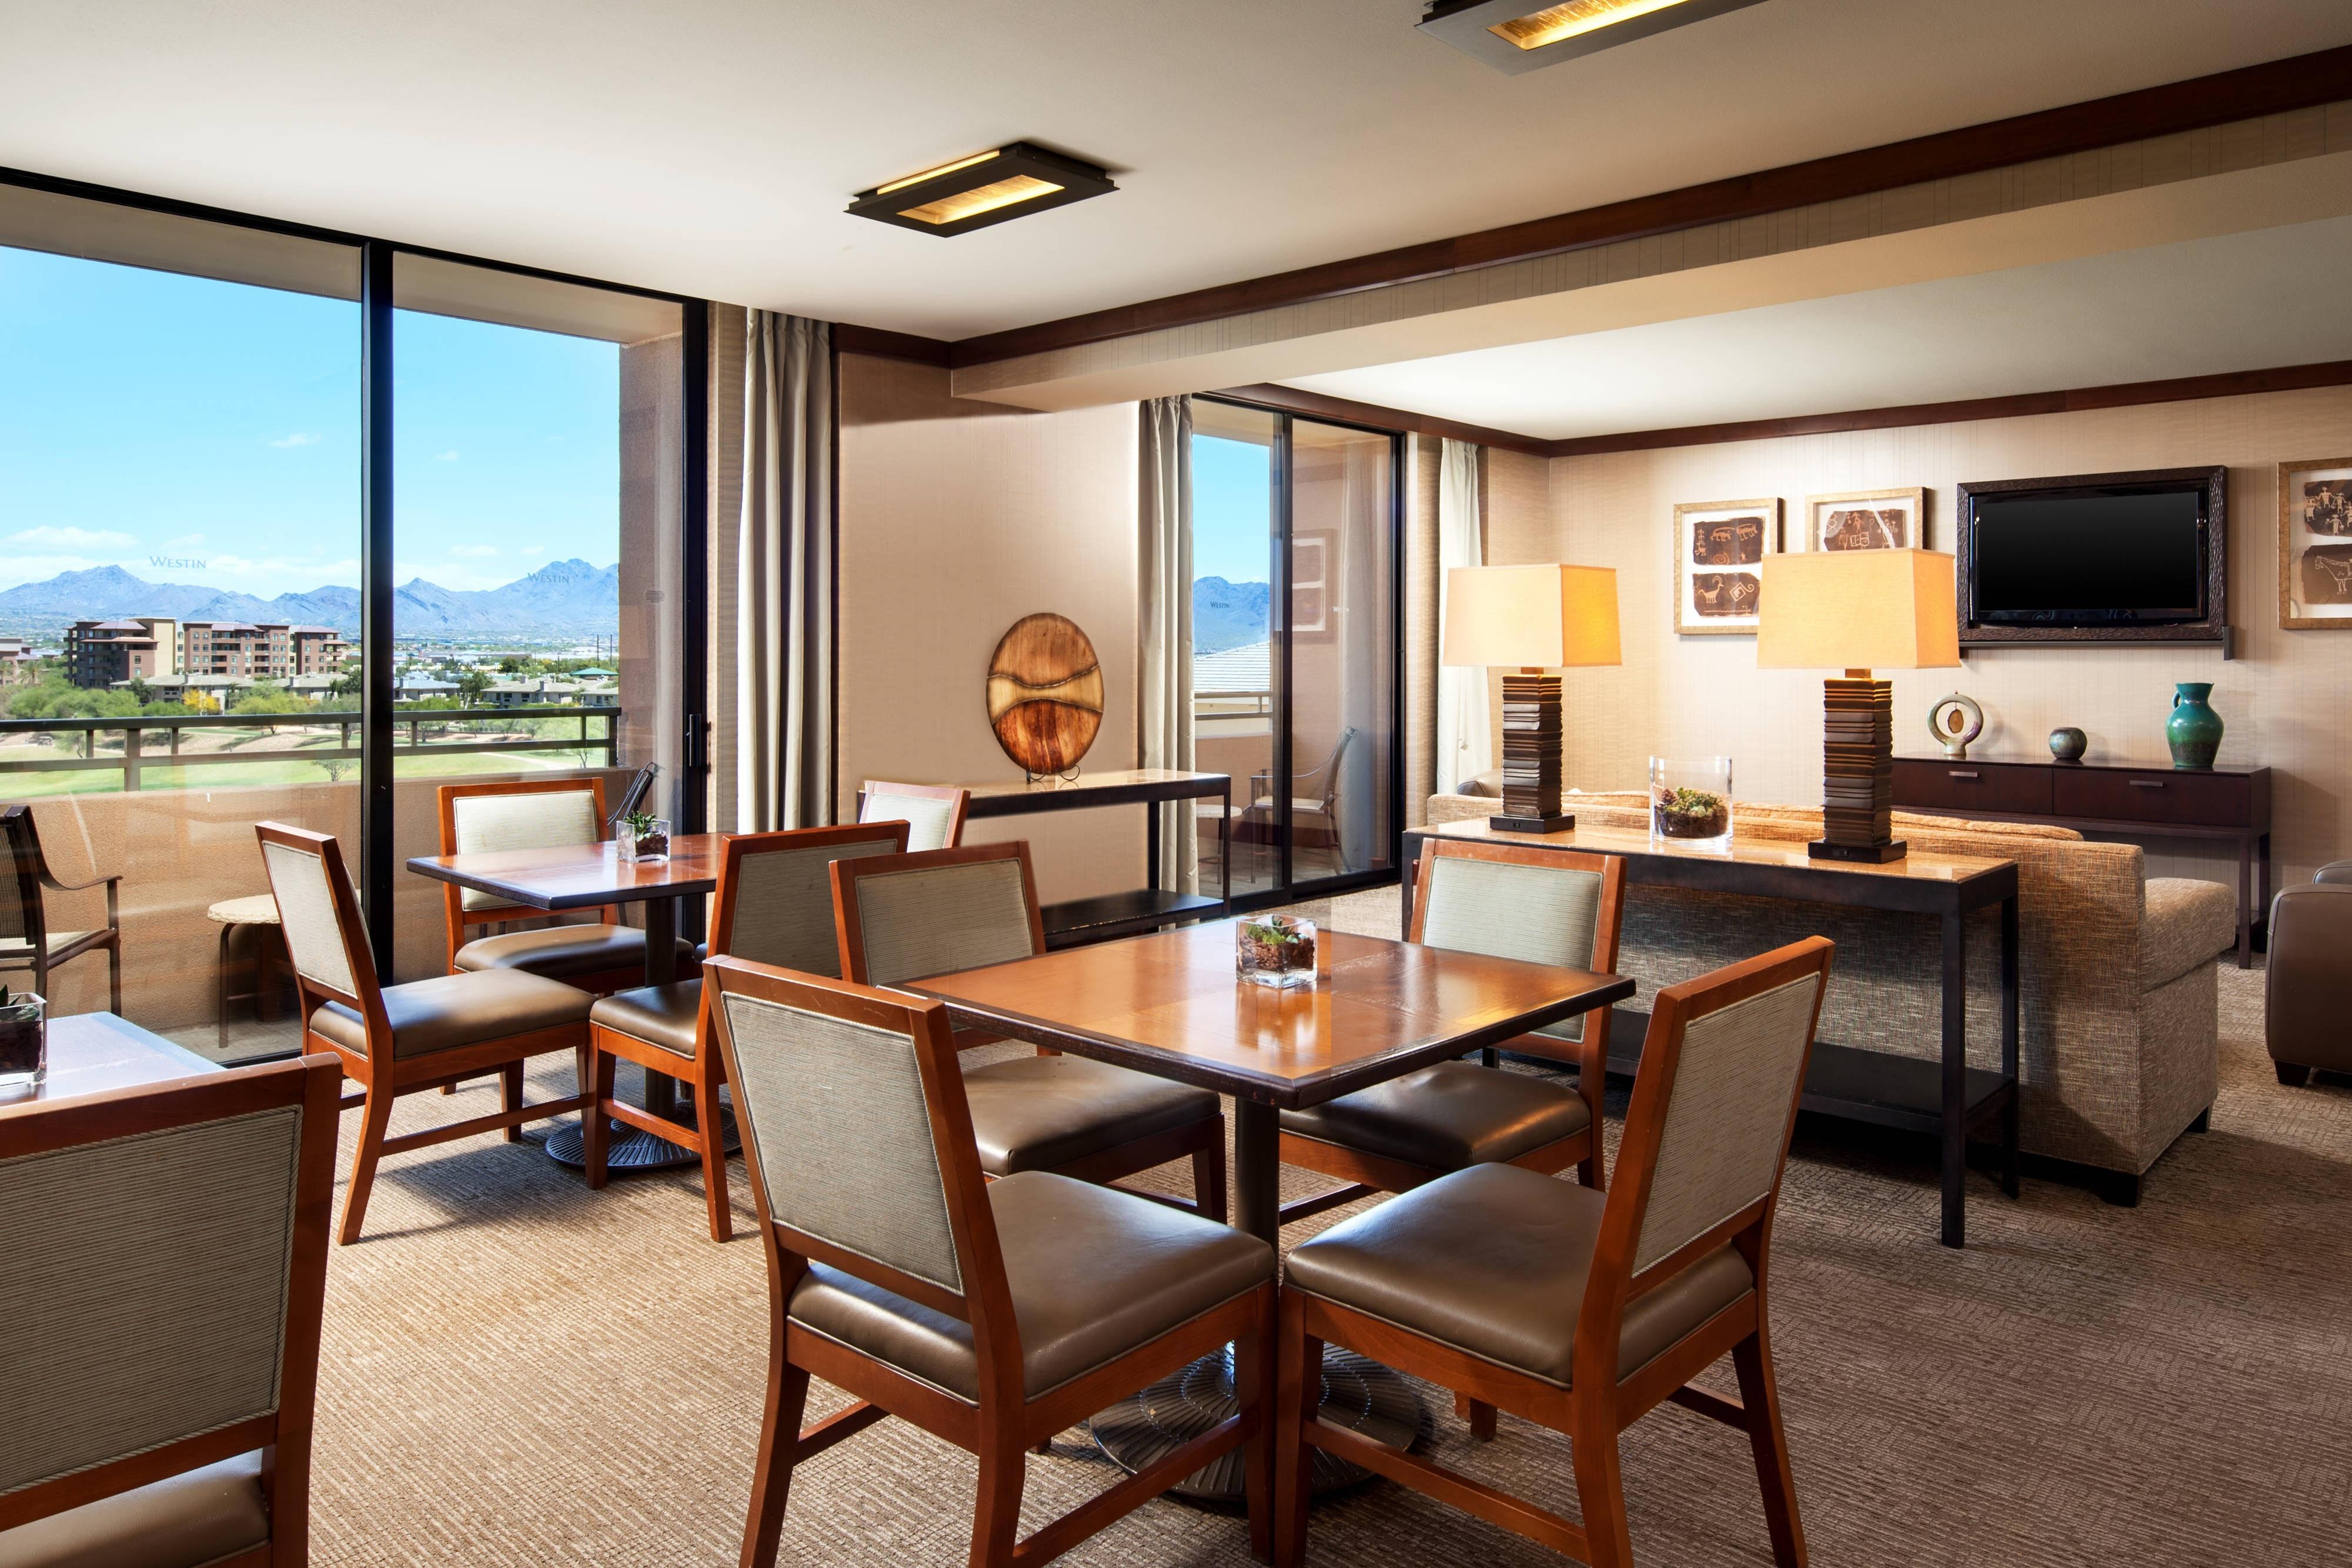 Royal Peaks Lounge